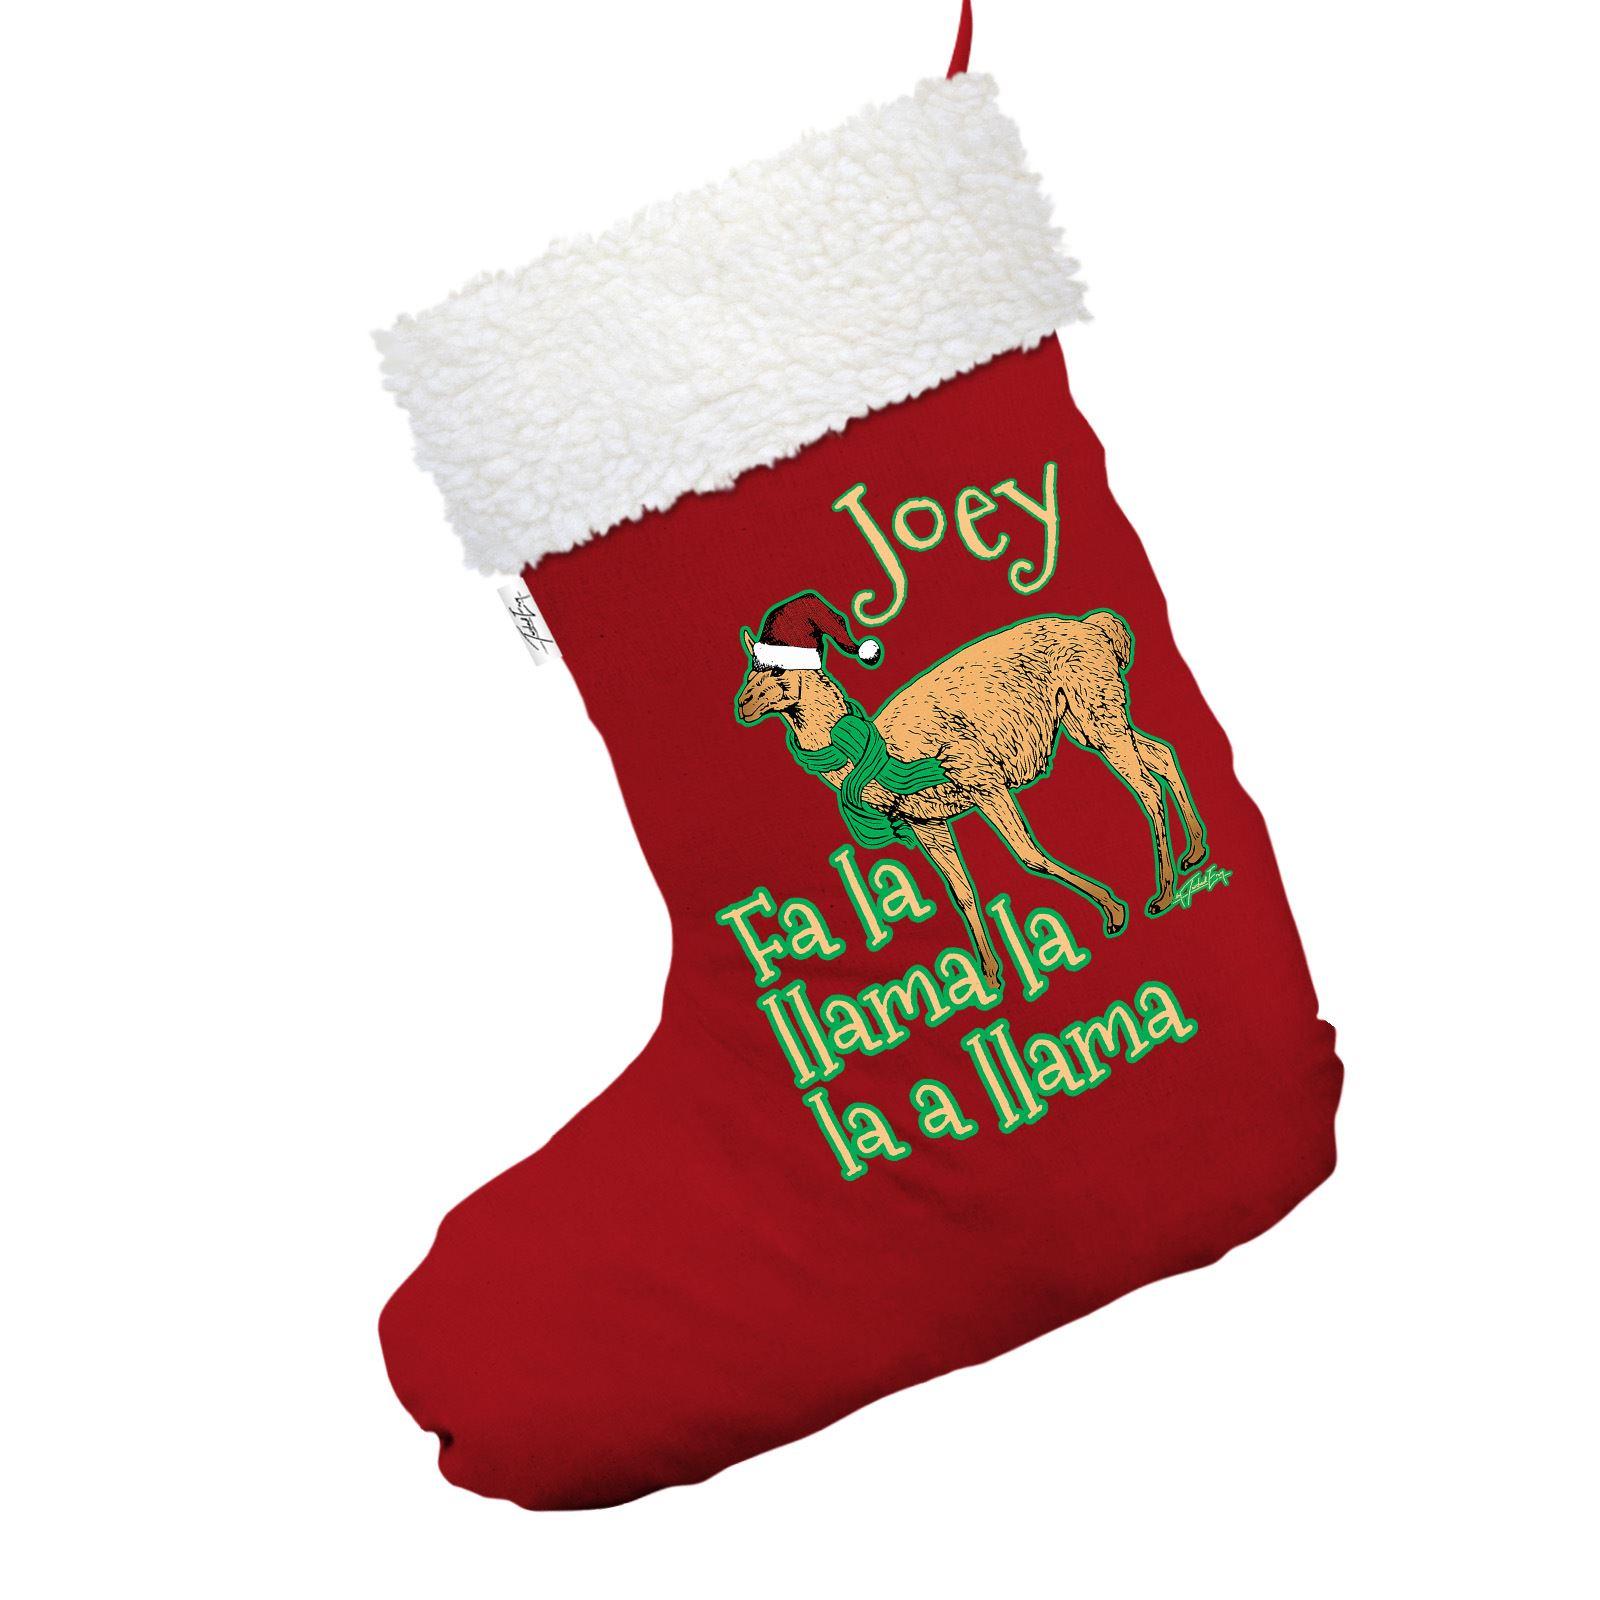 Llama Christmas Stocking.Details About Fa La Llama Personalised Red Christmas Stocking With White Faux Fur Trim